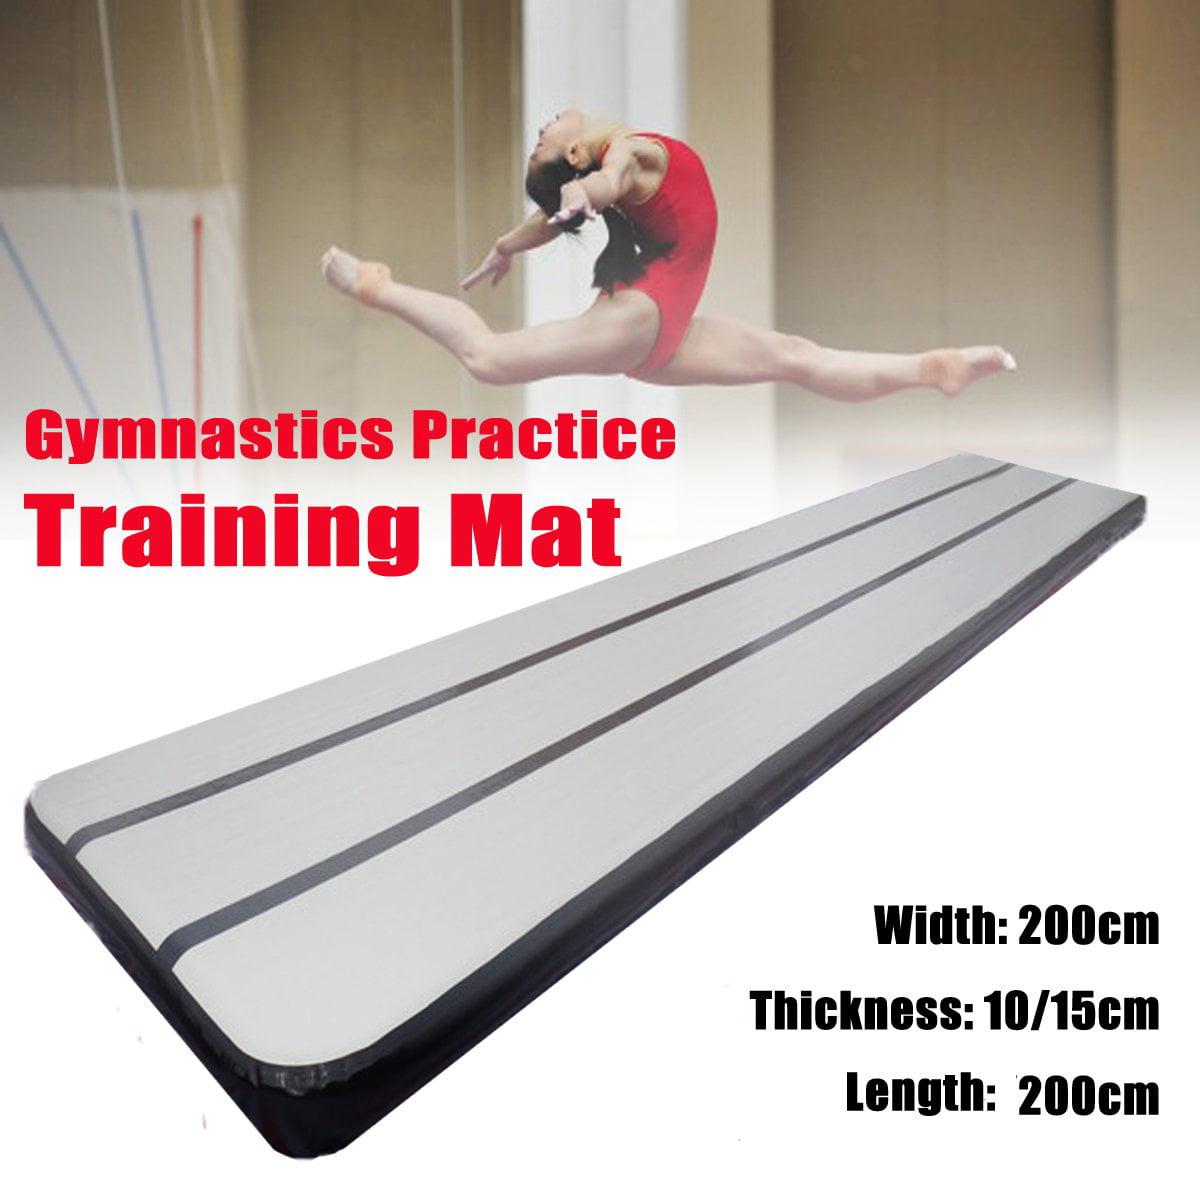 "79""x79"" Inflatable Air Balance Beam Gymnastics Air Track Floor Mats Tumbling Mat Practice Exercise inflatablecushion Training Yoga Pad, Taekwondo, Cheerleading,Black & Gray"